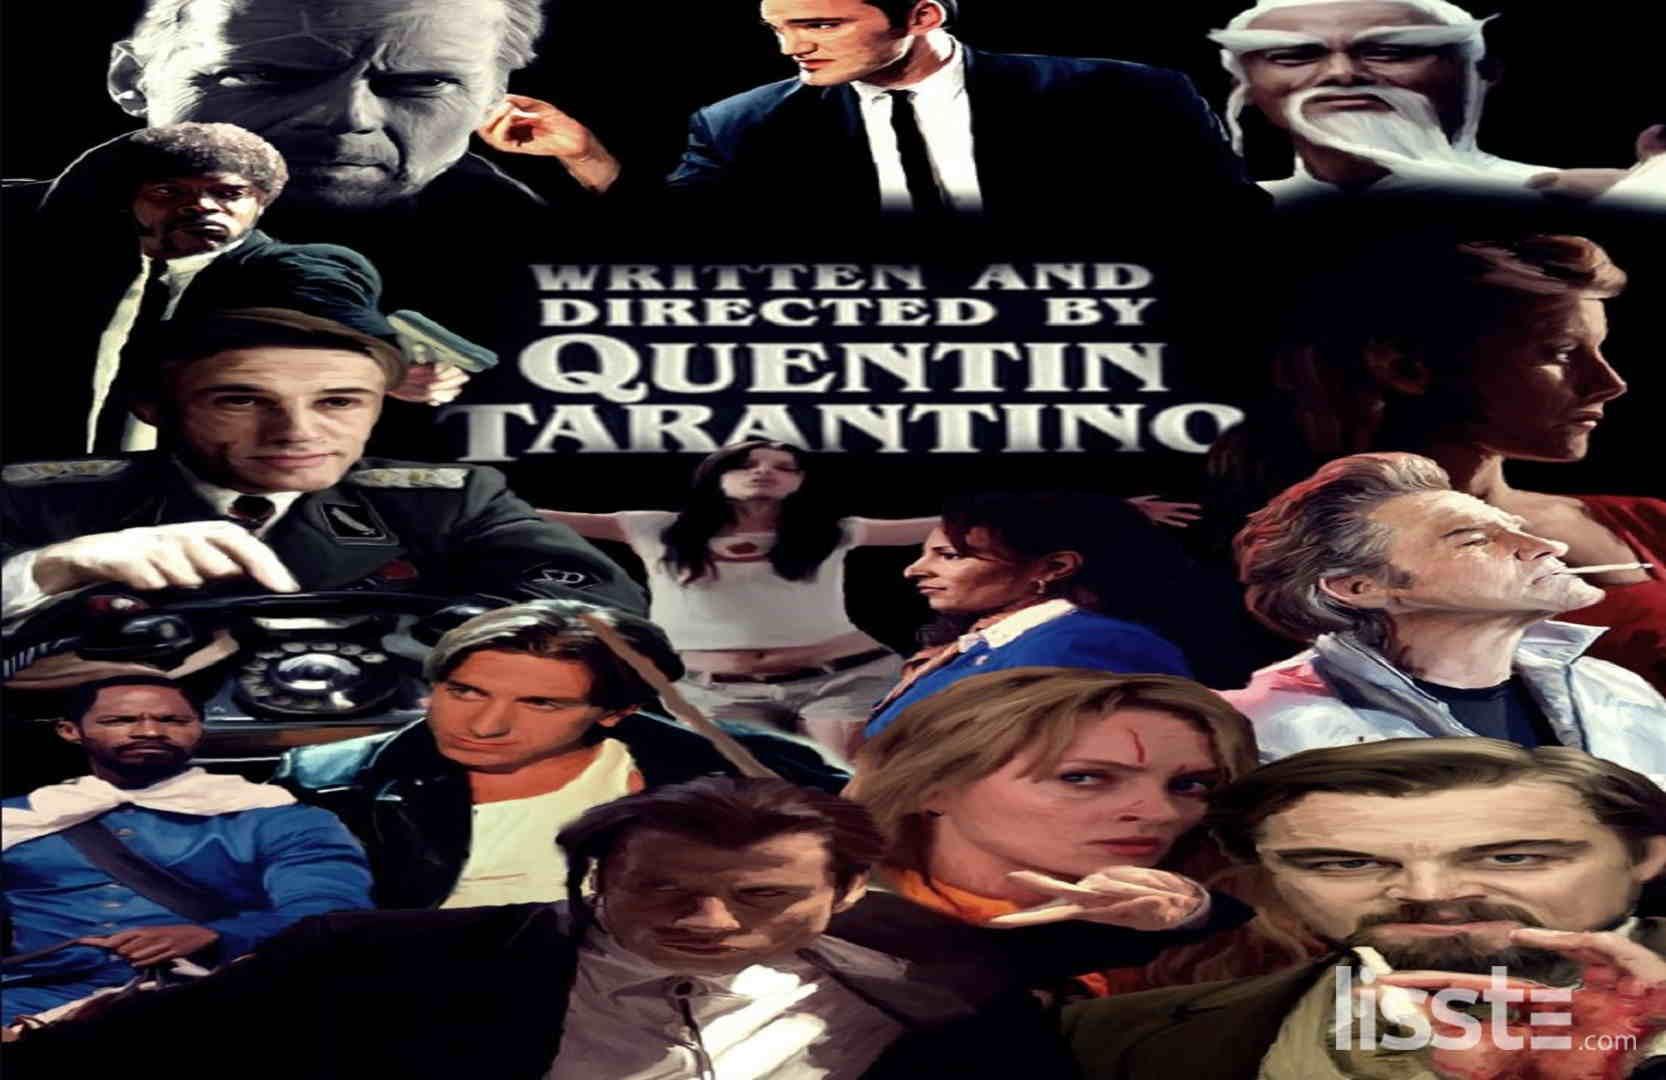 quentin_tarantino_movies_by_rearwart-d8ujpsl-1567426818.jpg